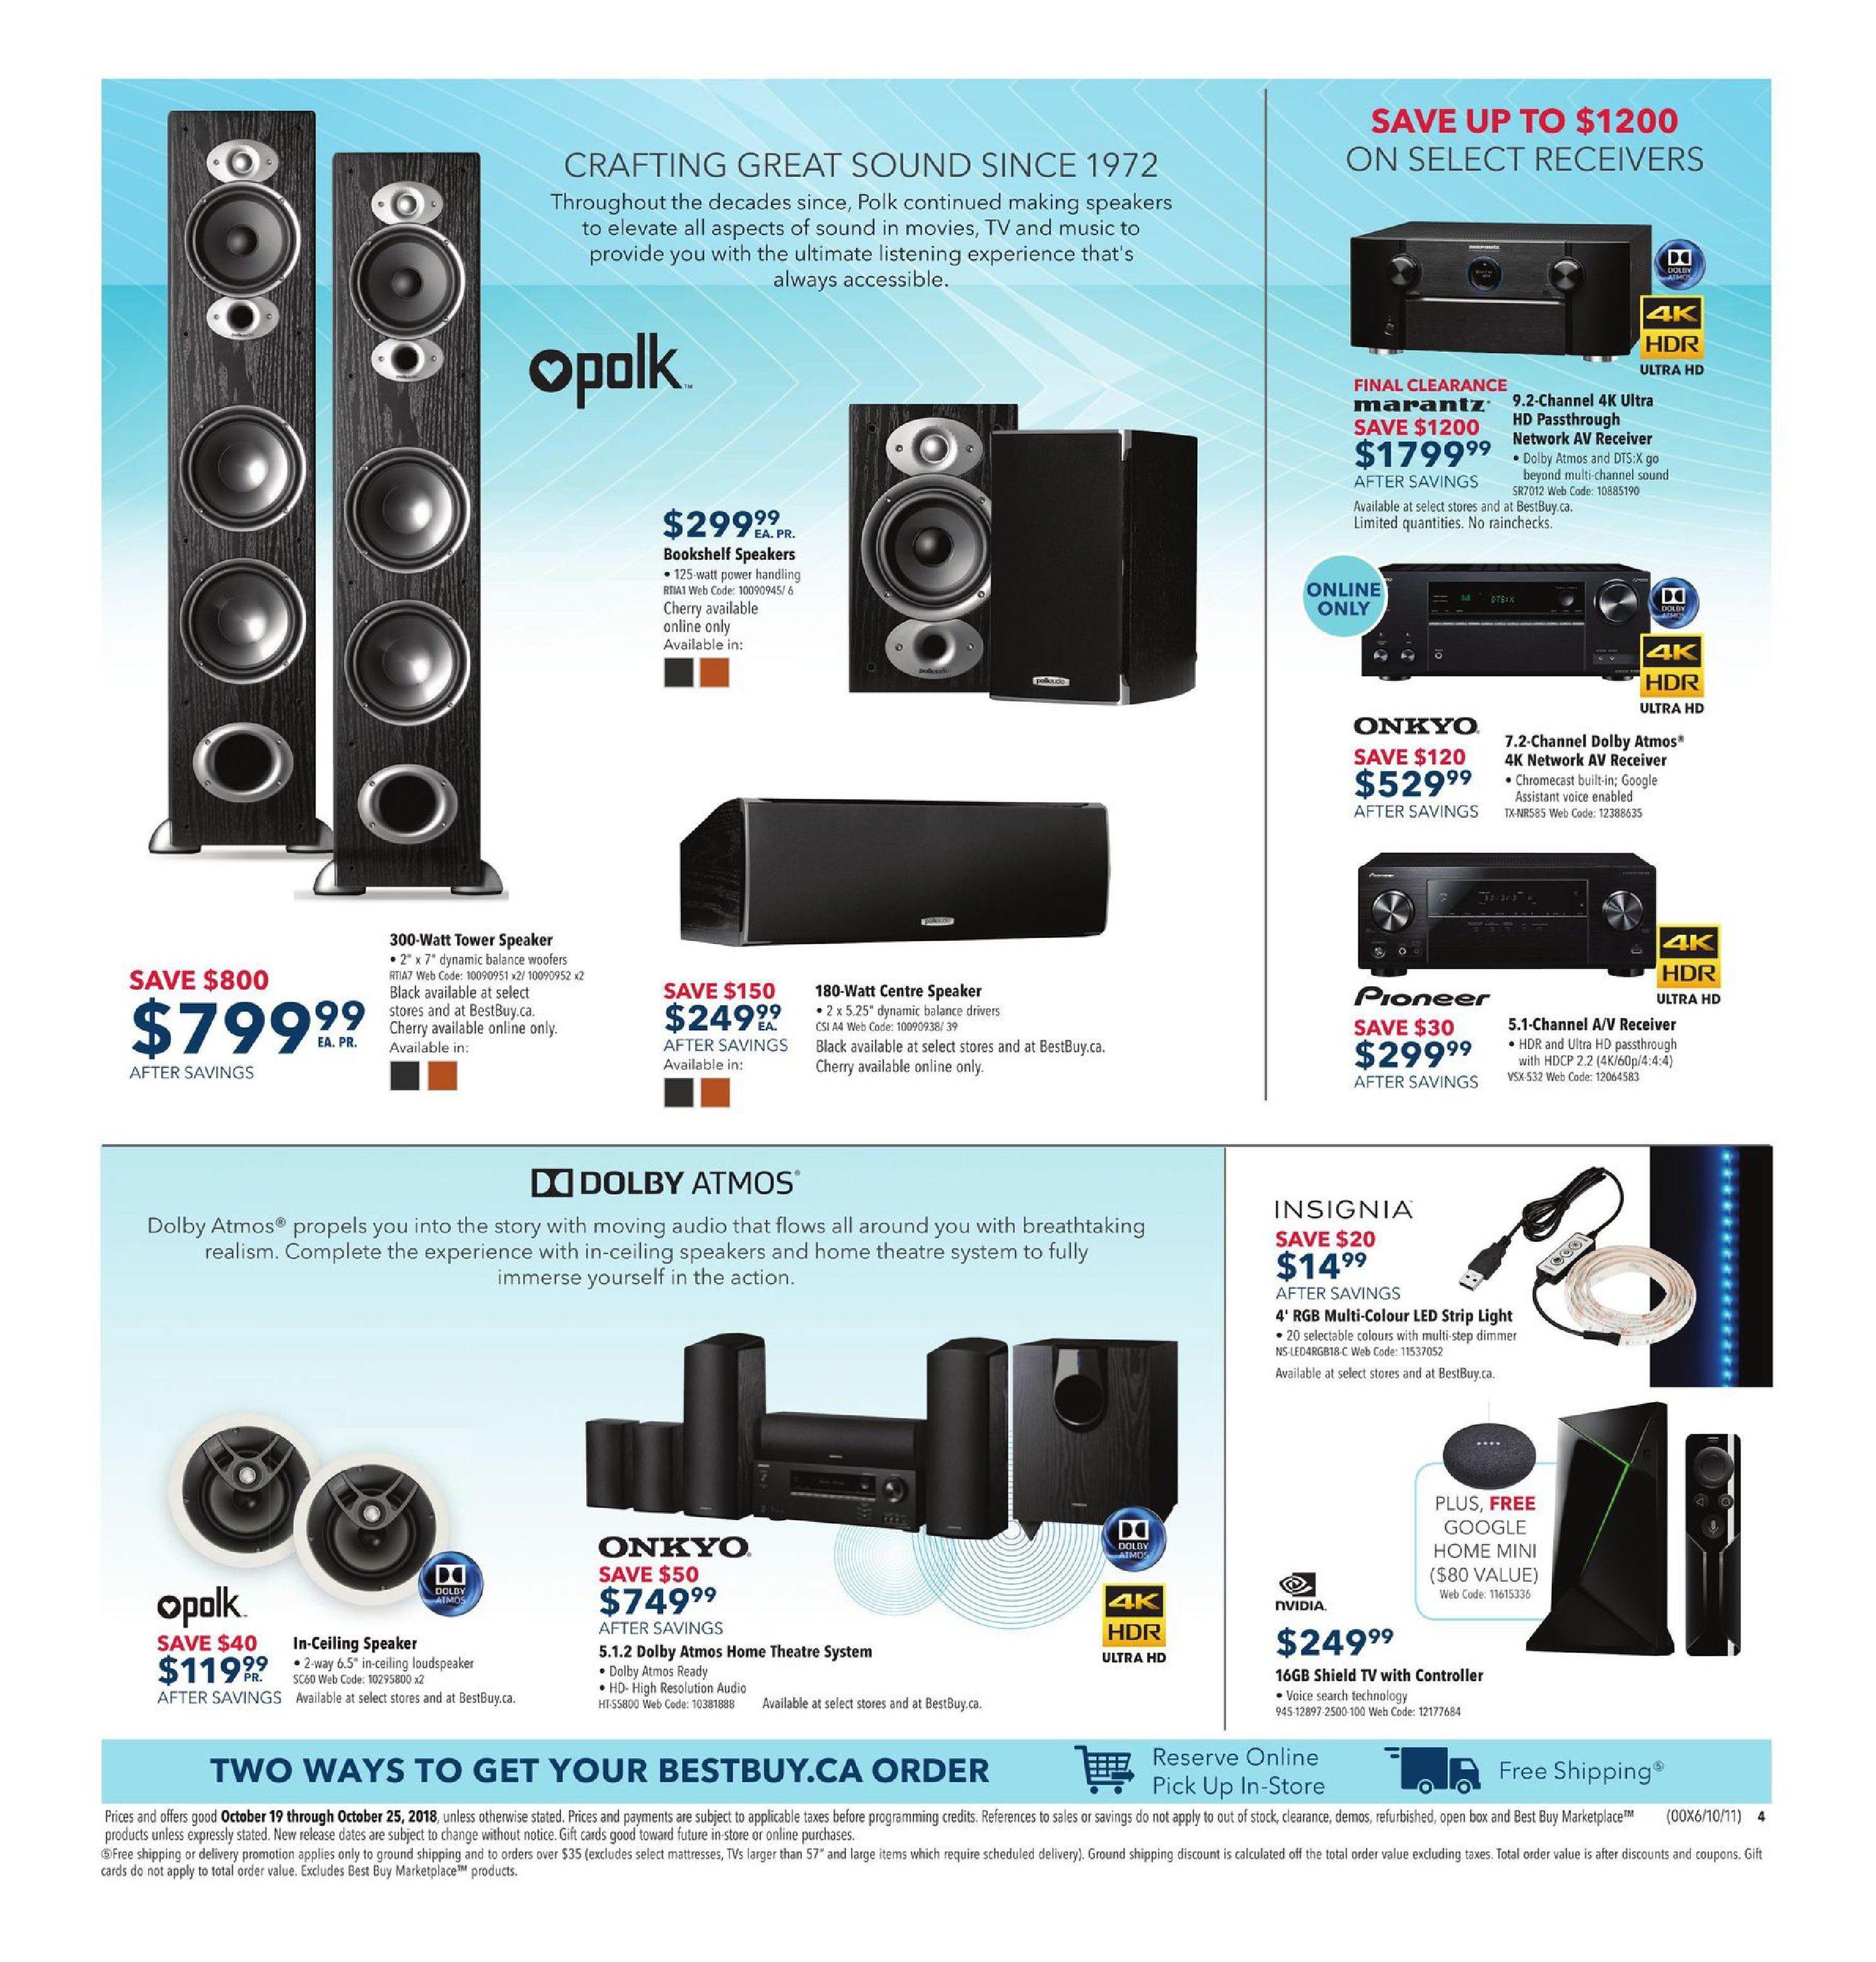 Best Buy Weekly Flyer Smart Savings On Tech Oct Digital Alliance Mouse Gaming G7 Alpha Drak Gray 19 25